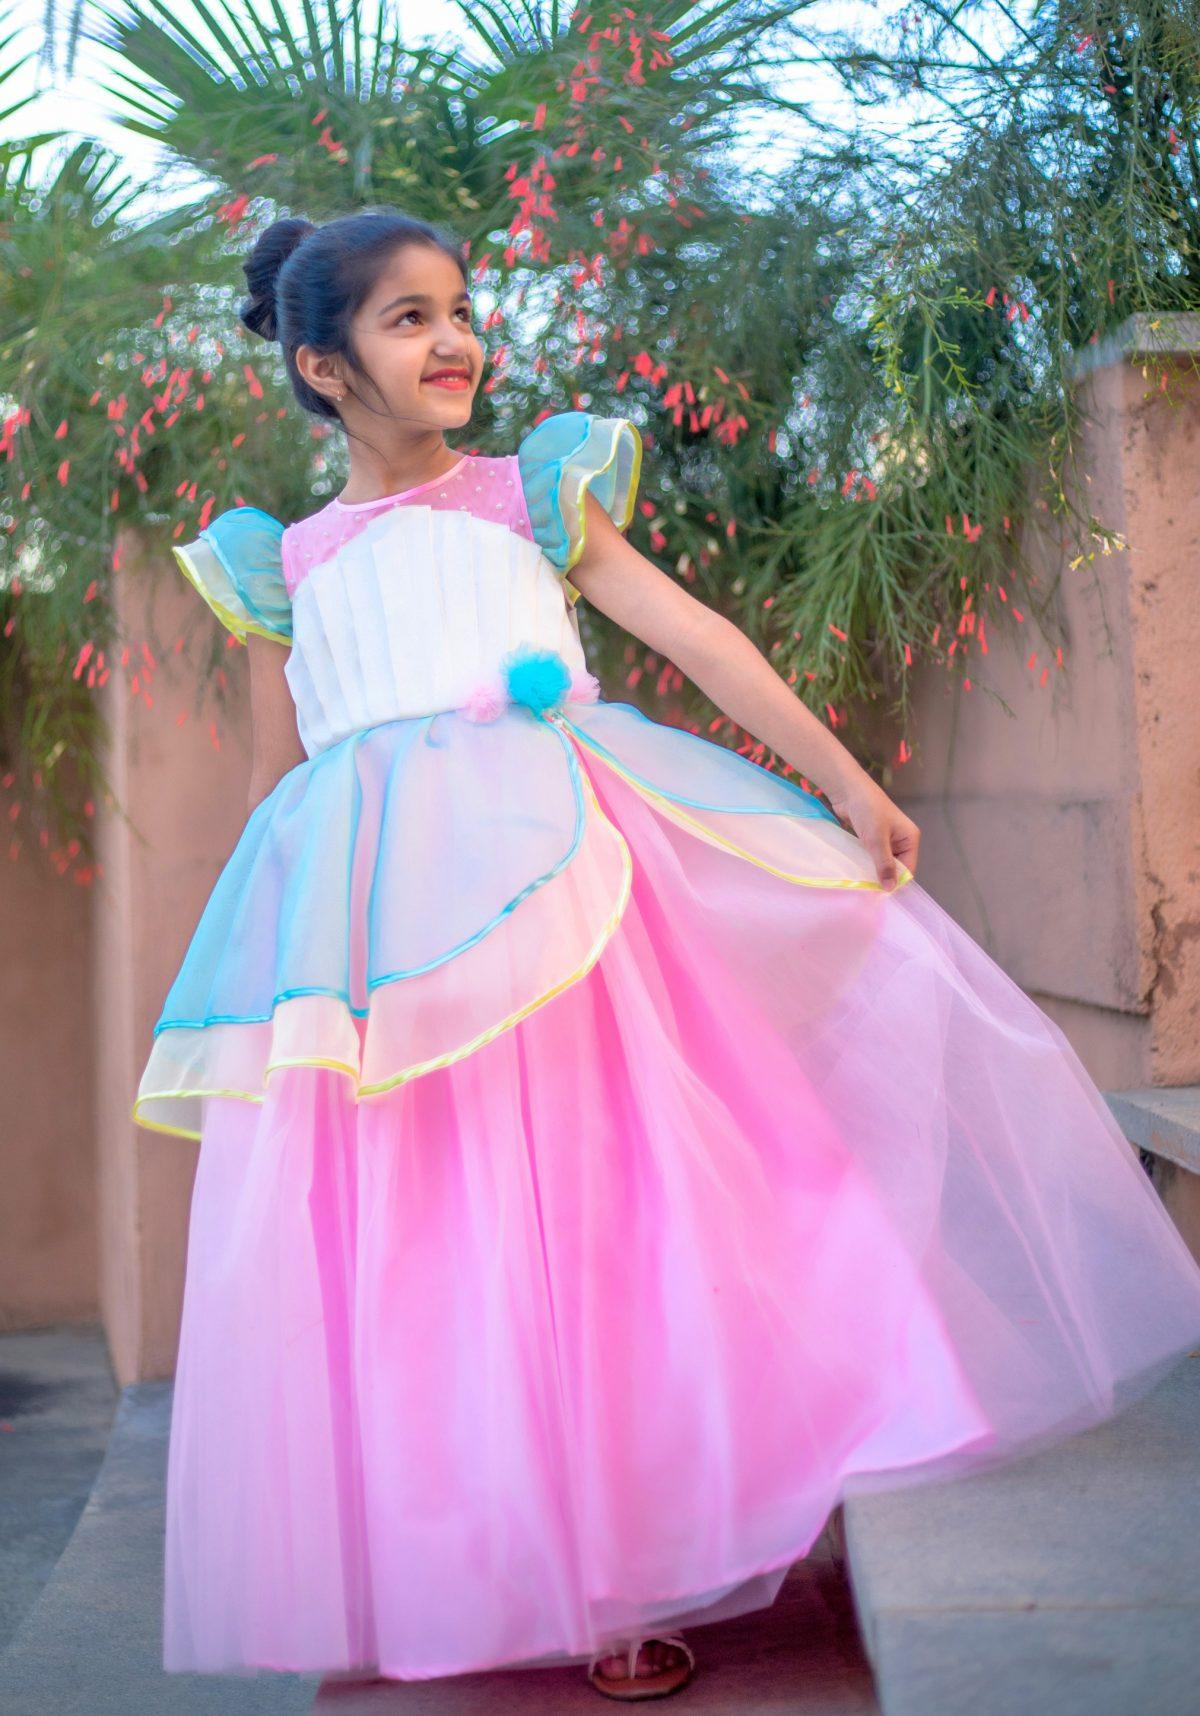 IMGL0145 1 scaled Unicorn Theme Birthday Dress